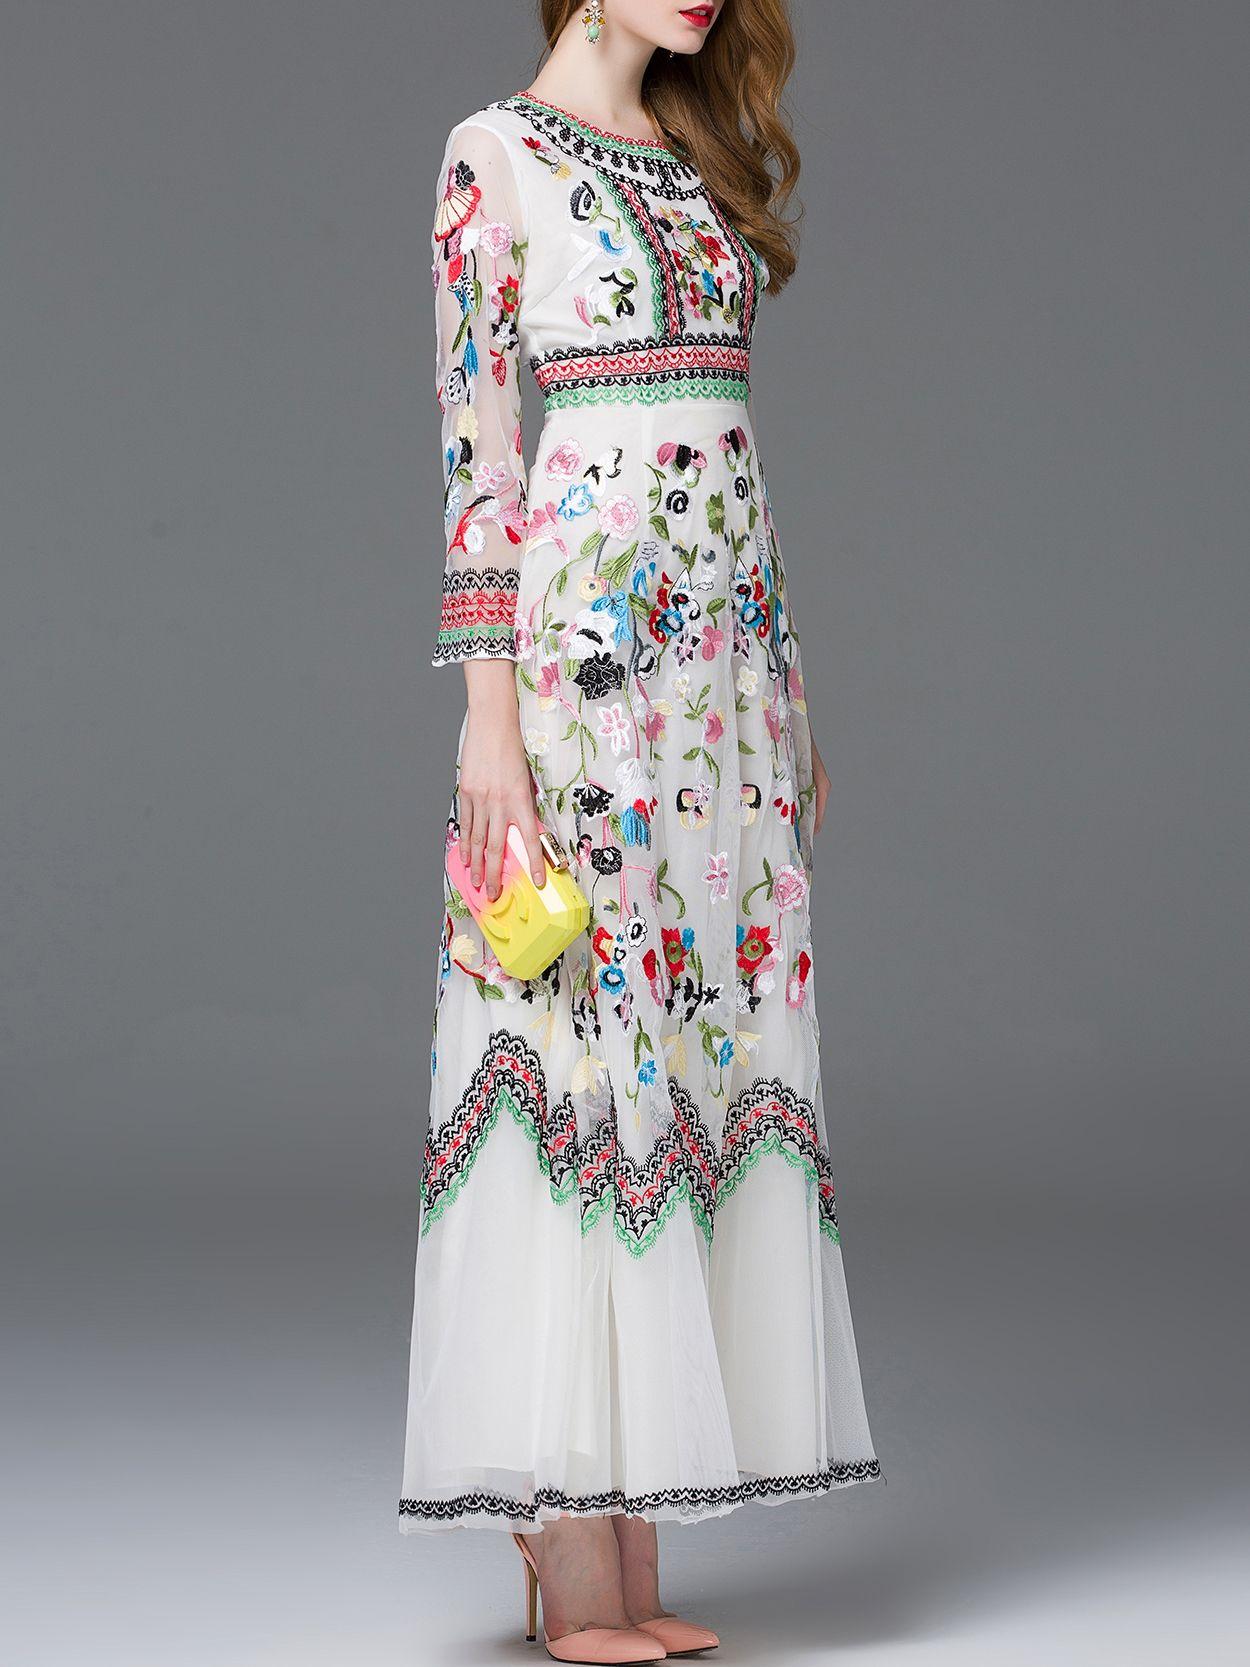 Vestido bordado maxi blanco fashion pinterest boho clothes